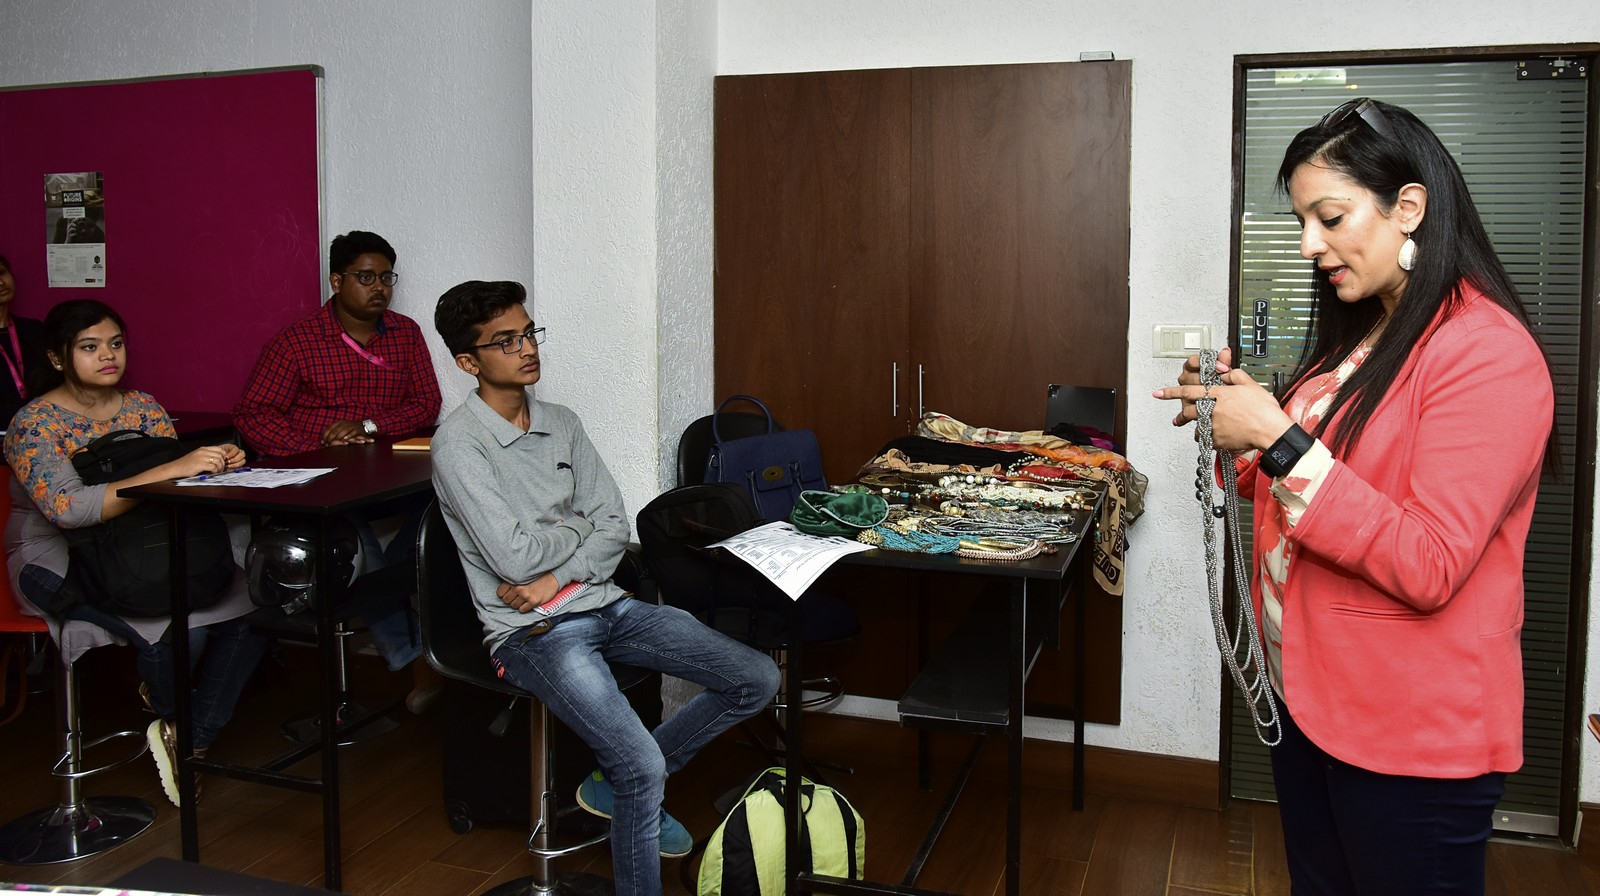 Image Consultation Workshop - Department of Fashion Design image consultation workshop - Image Consultation Workshop Department of Fashion Design Interior Design and Jewellery Design 1 - Image Consultation Workshop – Department of Fashion Design